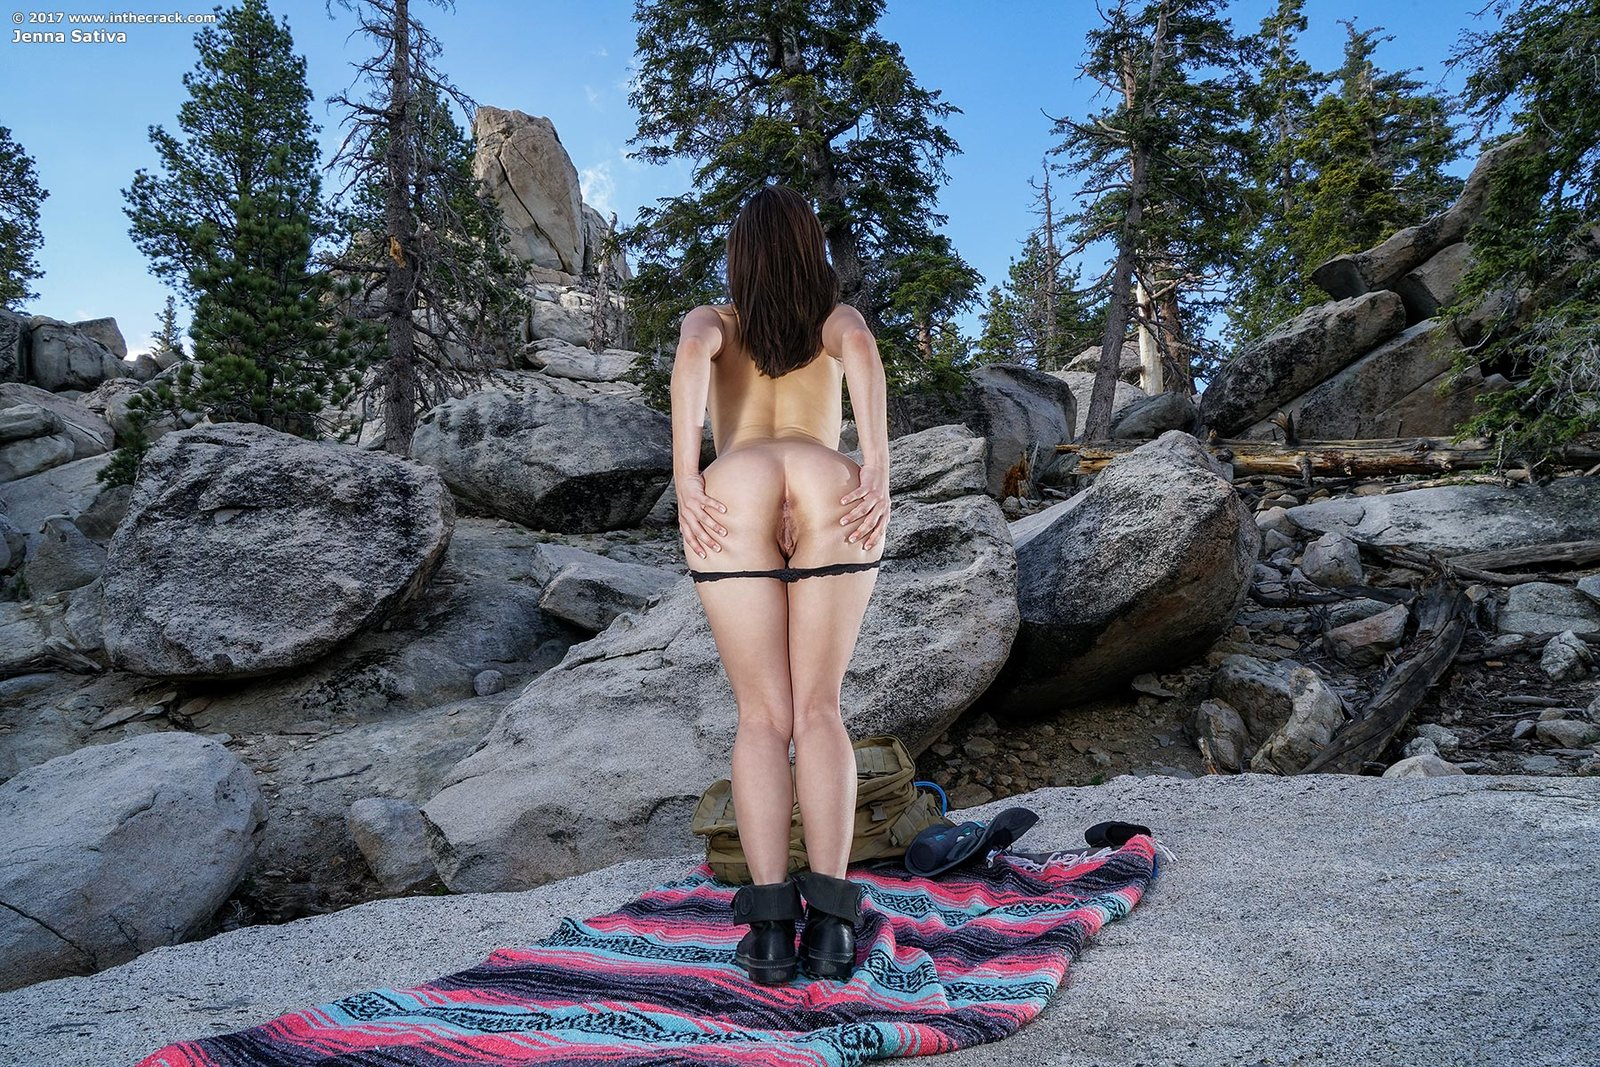 Zdjęcie porno - 0613 - Suczka na skale